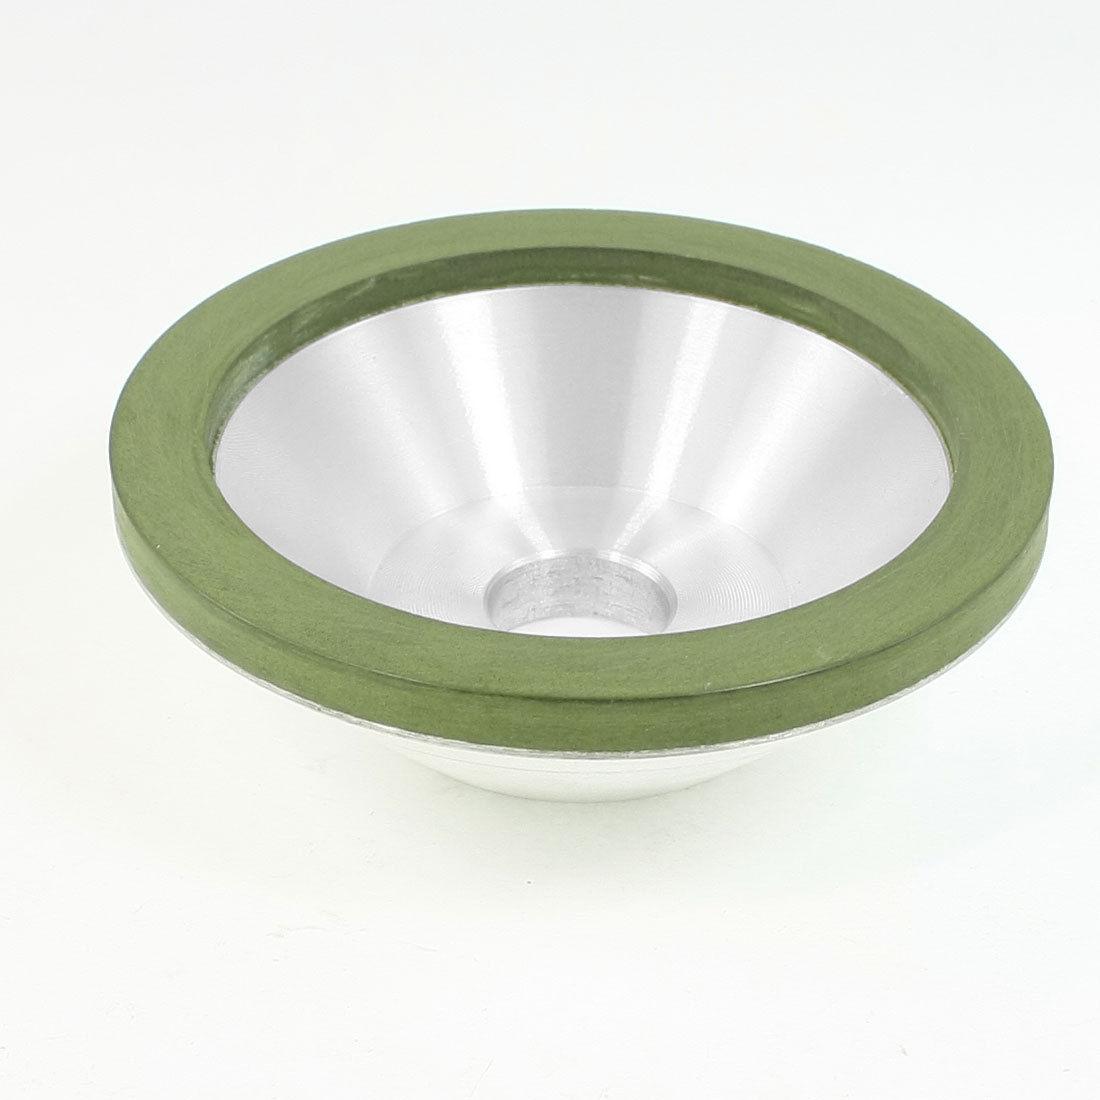 100mm OD 20mm Mounted Hole Resin Bond 1000 Grit Diamond Grinding Wheel LXM 1pc internal half segment 2 diamond wheel for glass straight line double edger dia175x8x8 hole 12 22 50 grit 150 180 bl007